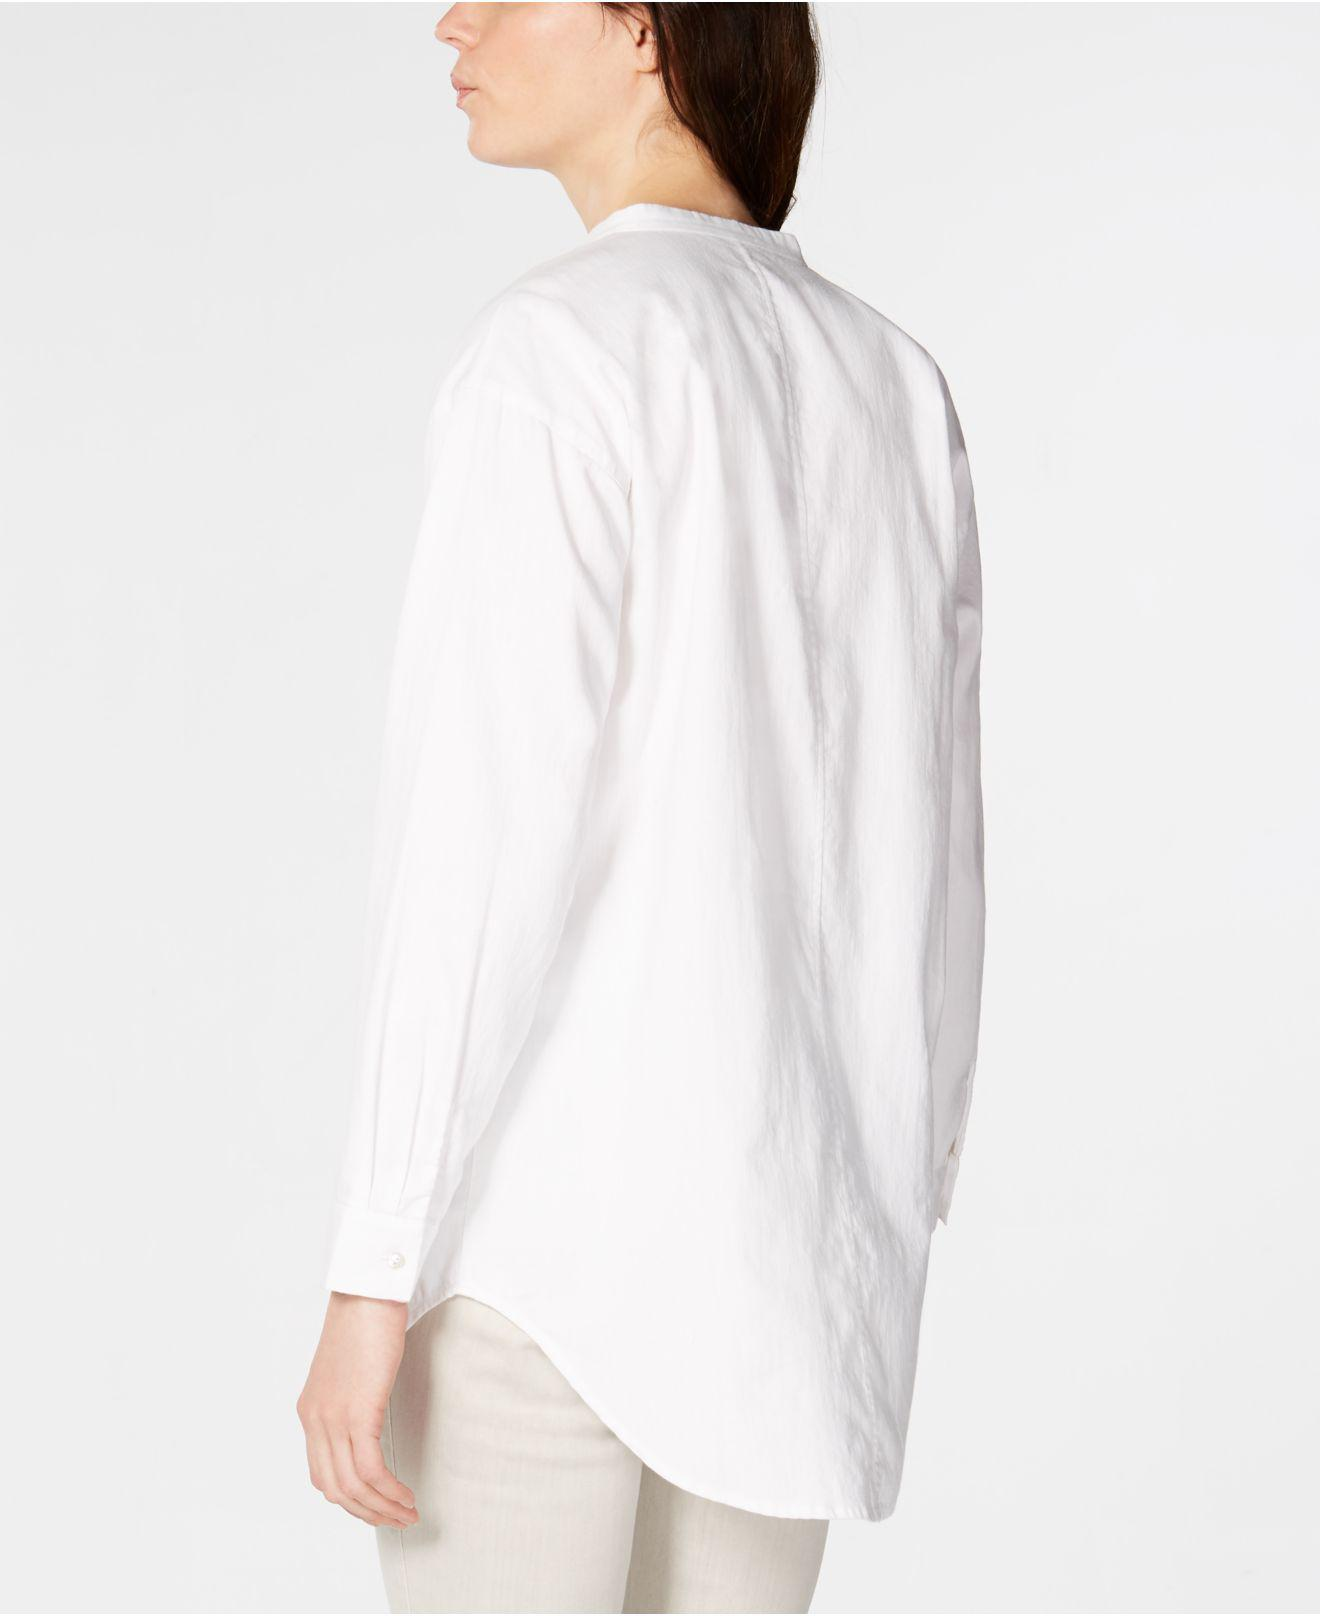 522b8247891 Lyst - Eileen Fisher Mandarin Collar Organic Cotton Twill Shirt in White